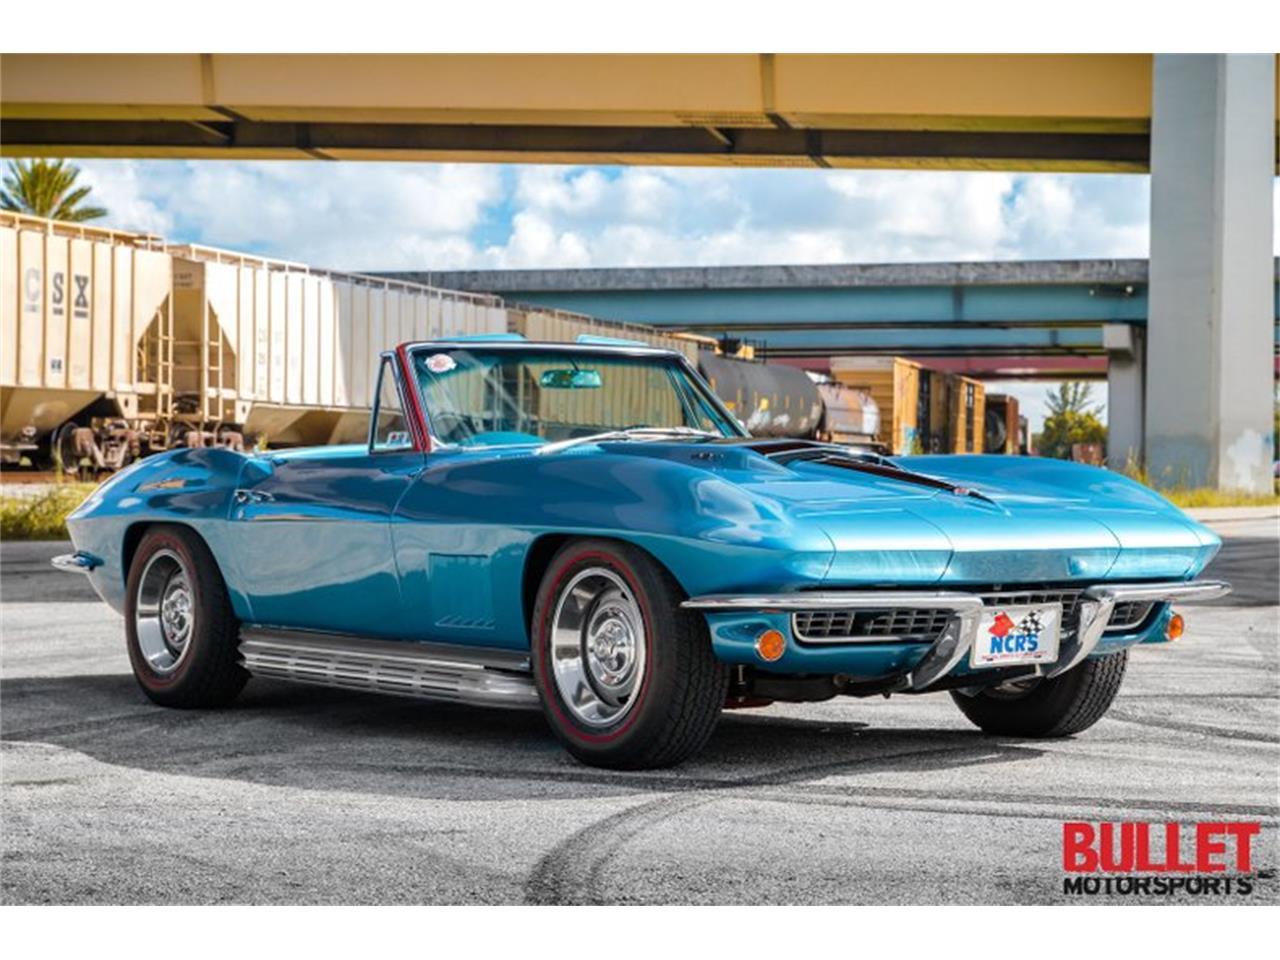 1967 Chevrolet Corvette (CC-1419965) for sale in Fort Lauderdale, Florida